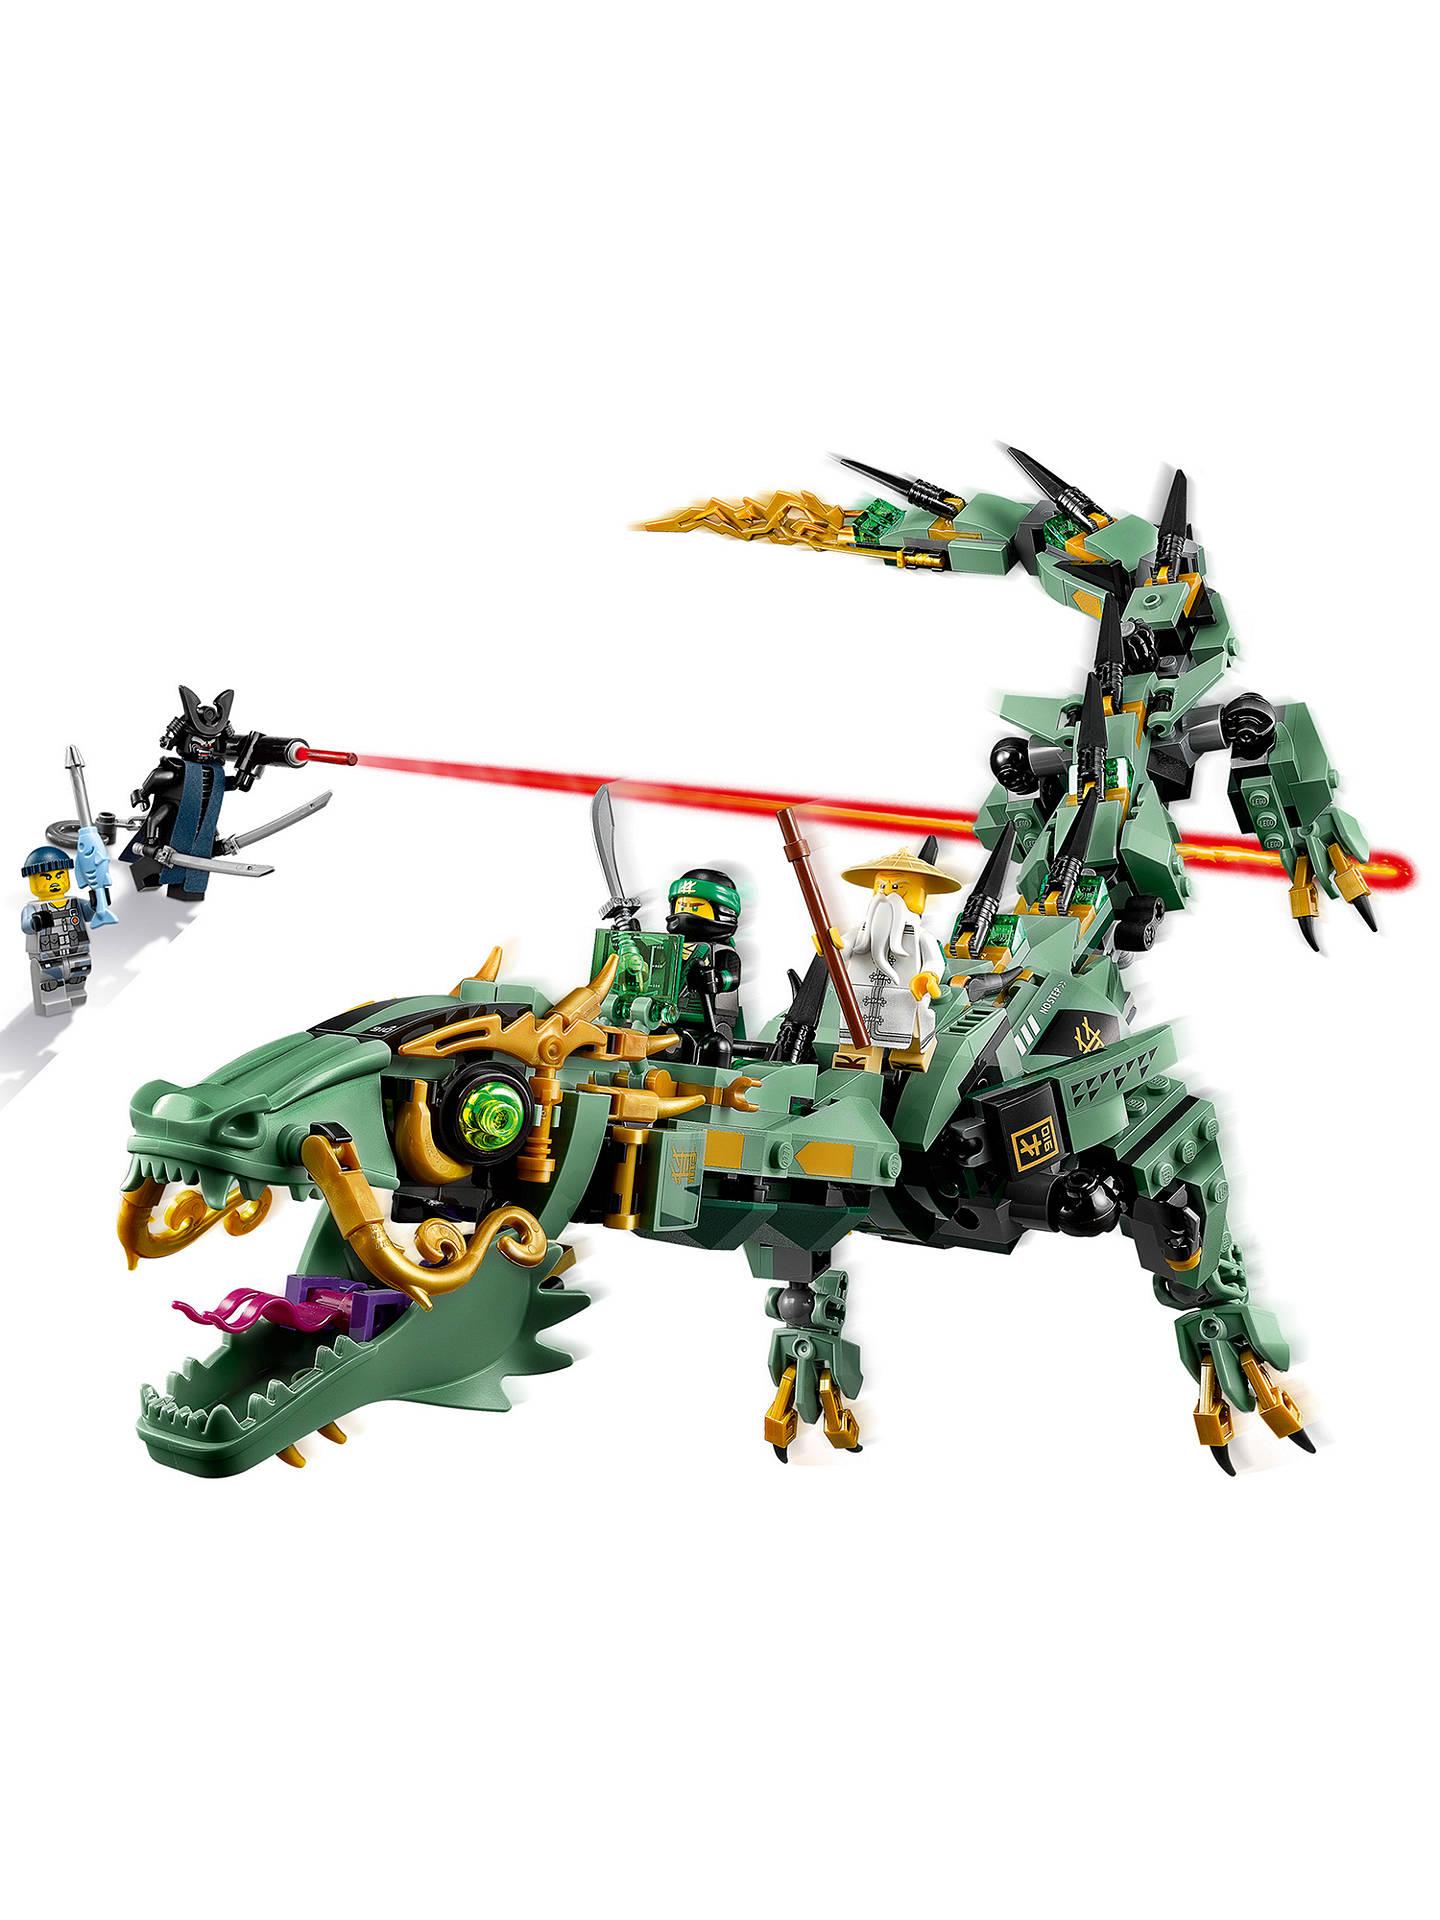 lego ninjago 70612 green ninja mech dragon at john lewis. Black Bedroom Furniture Sets. Home Design Ideas